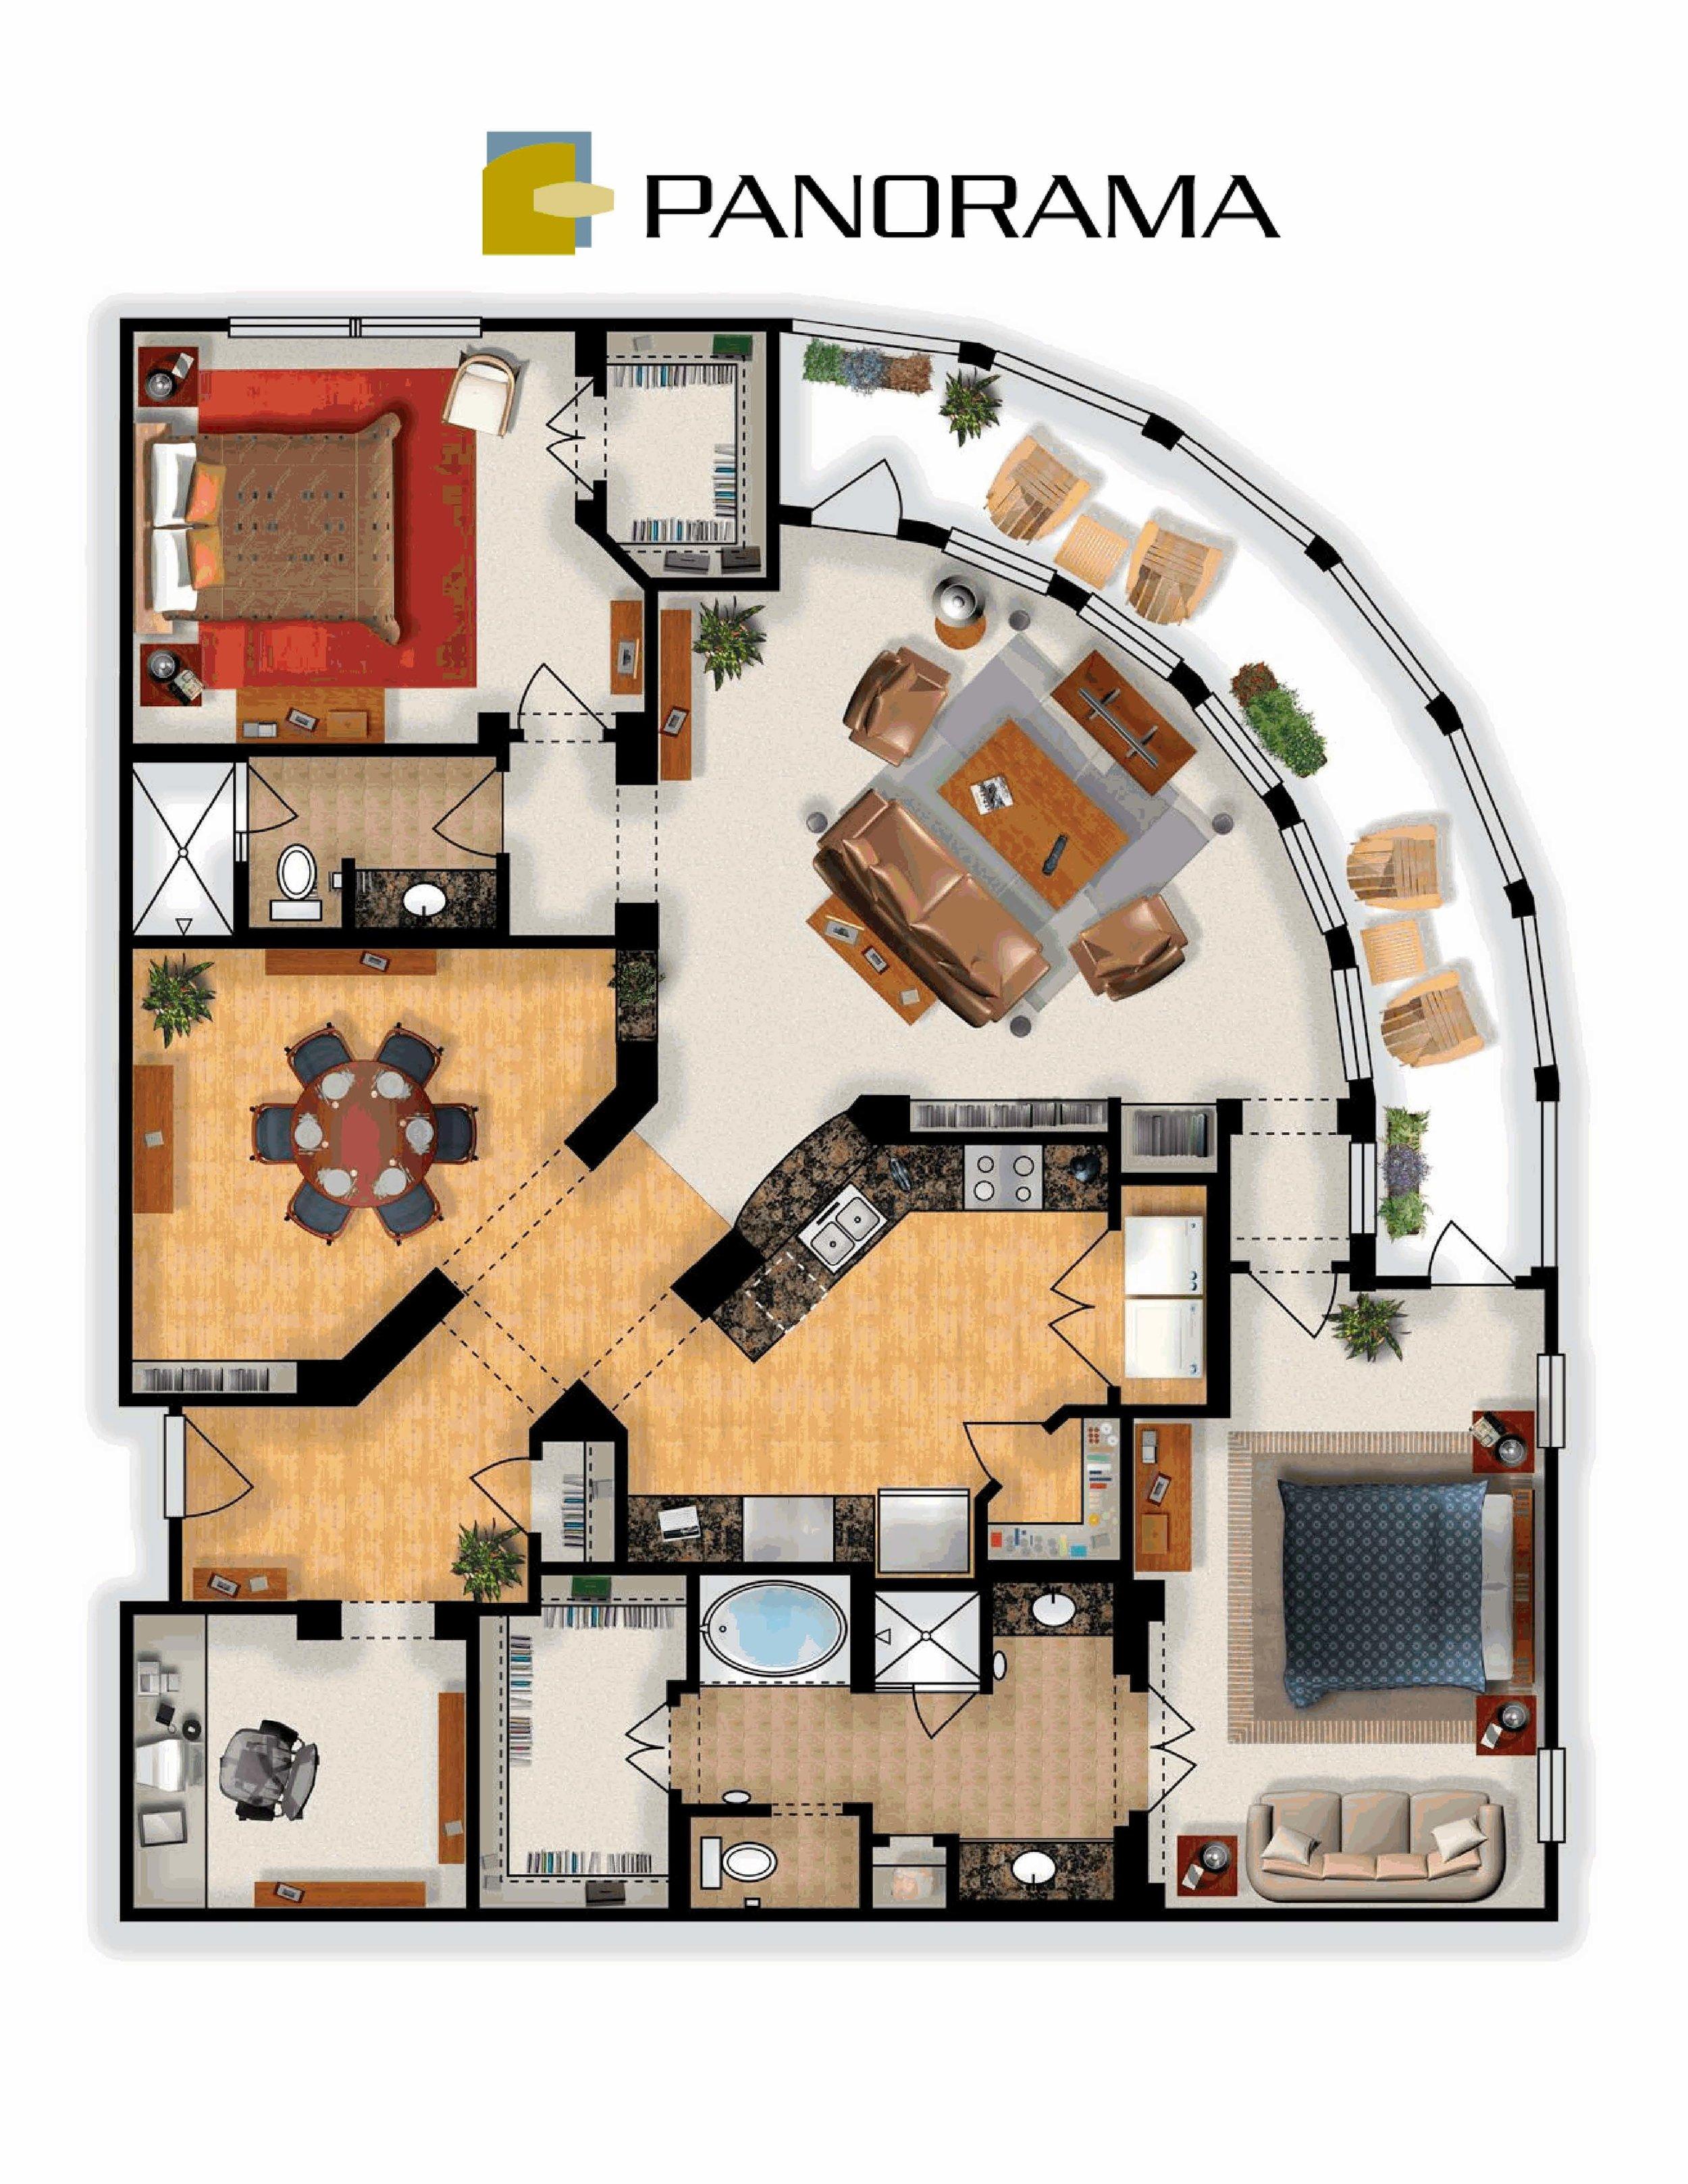 Panorama_Plan.jpg